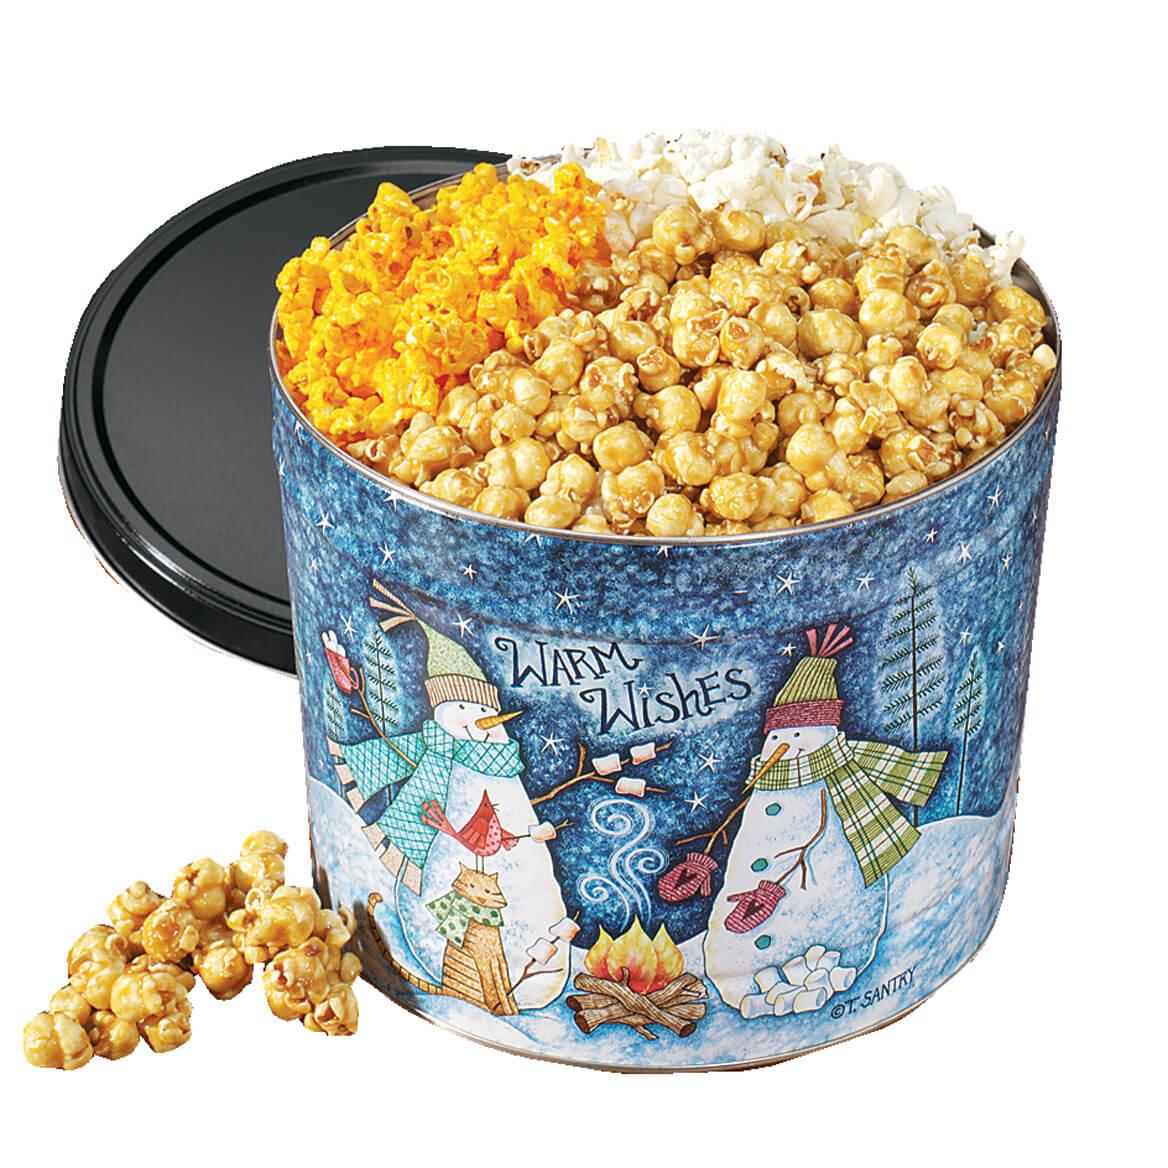 Personalized Popcorn Tin